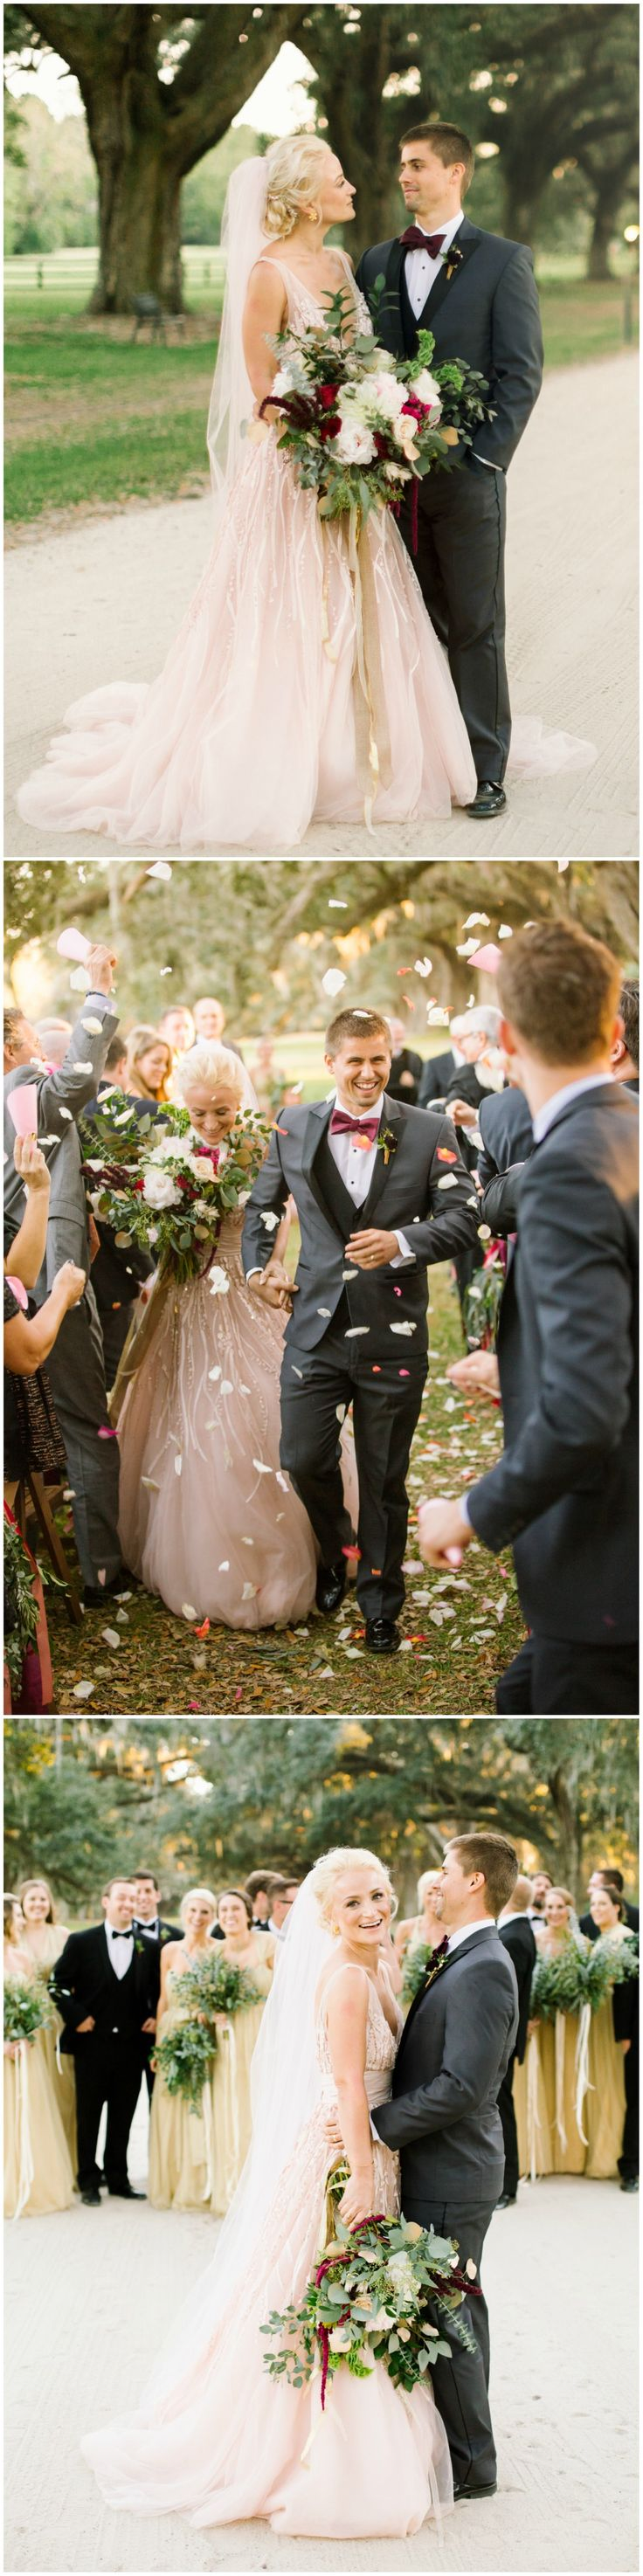 Romantic bride & groom wedding fashion, beaded wedding dress, bridal veil, grey groom suit, maroon bow-tie, follow this board for more romantic wedding inspiration // JoPhoto